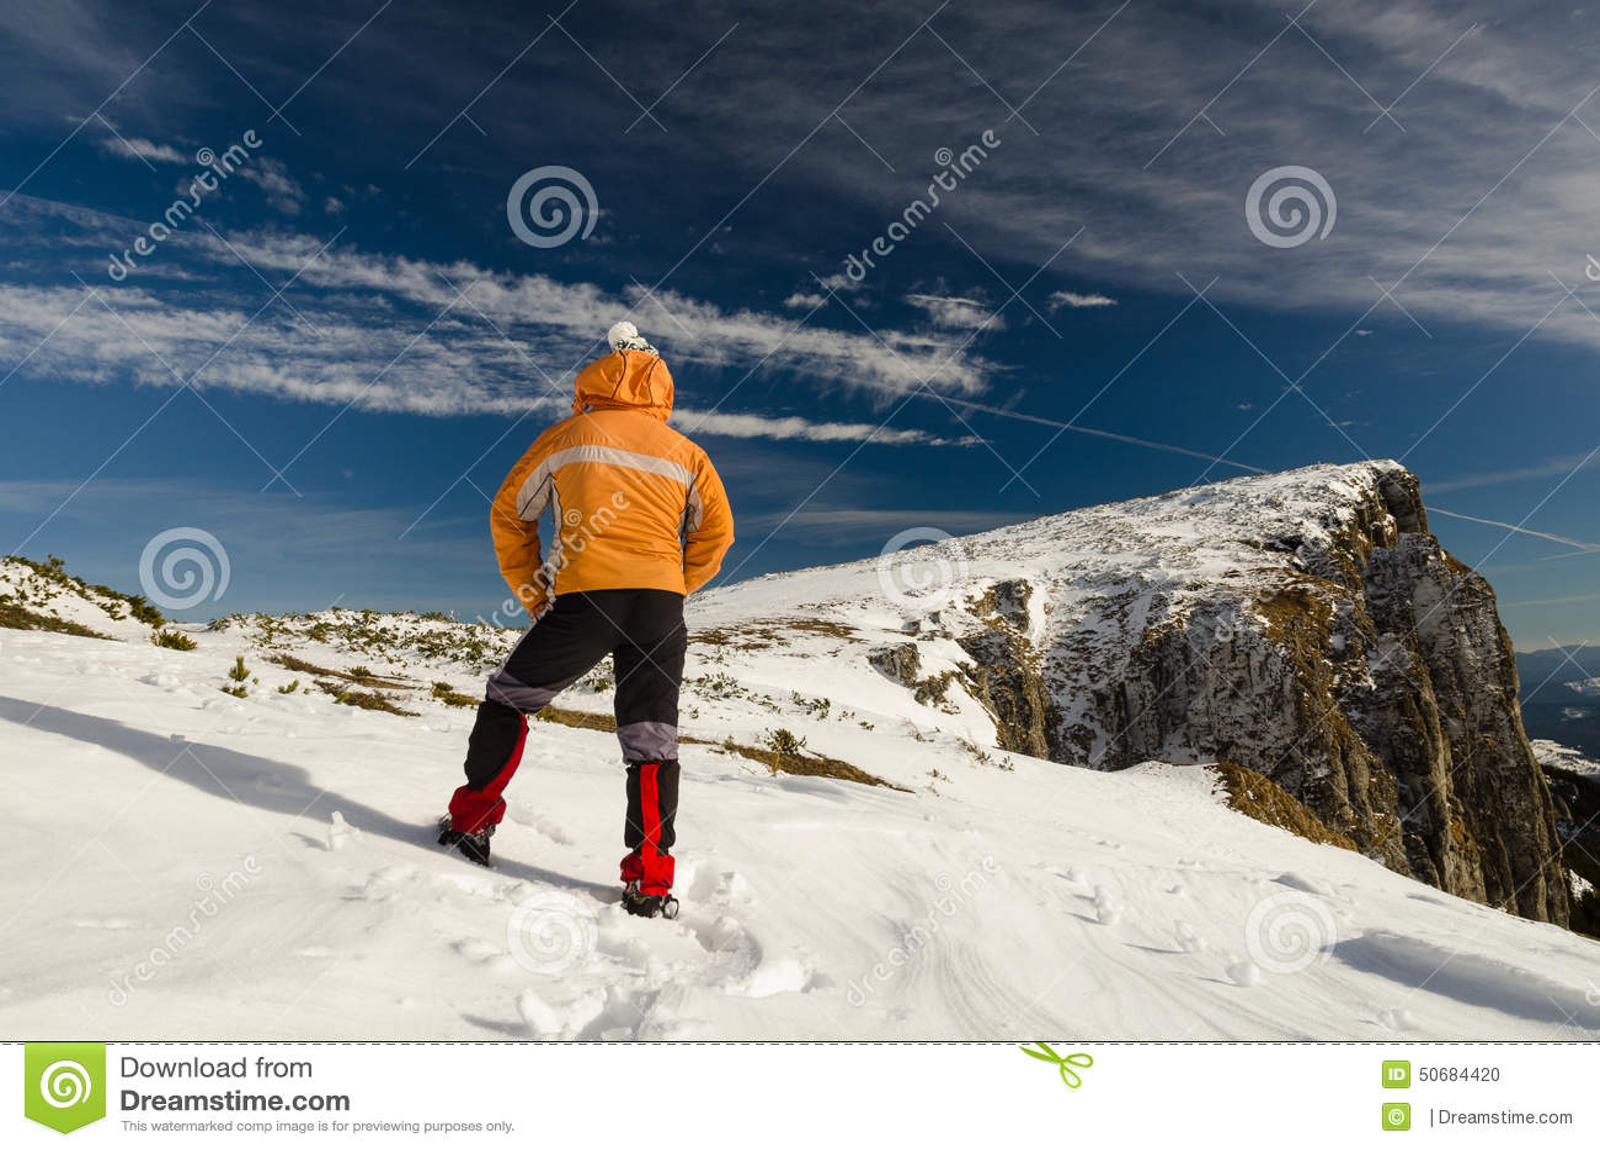 Download 冬时的山旅客 库存照片. 图片 包括有 冬天, 蓝色, 室外, 路径, 日出, 斯洛伐克, 滑雪, 投反对票 - 50684420